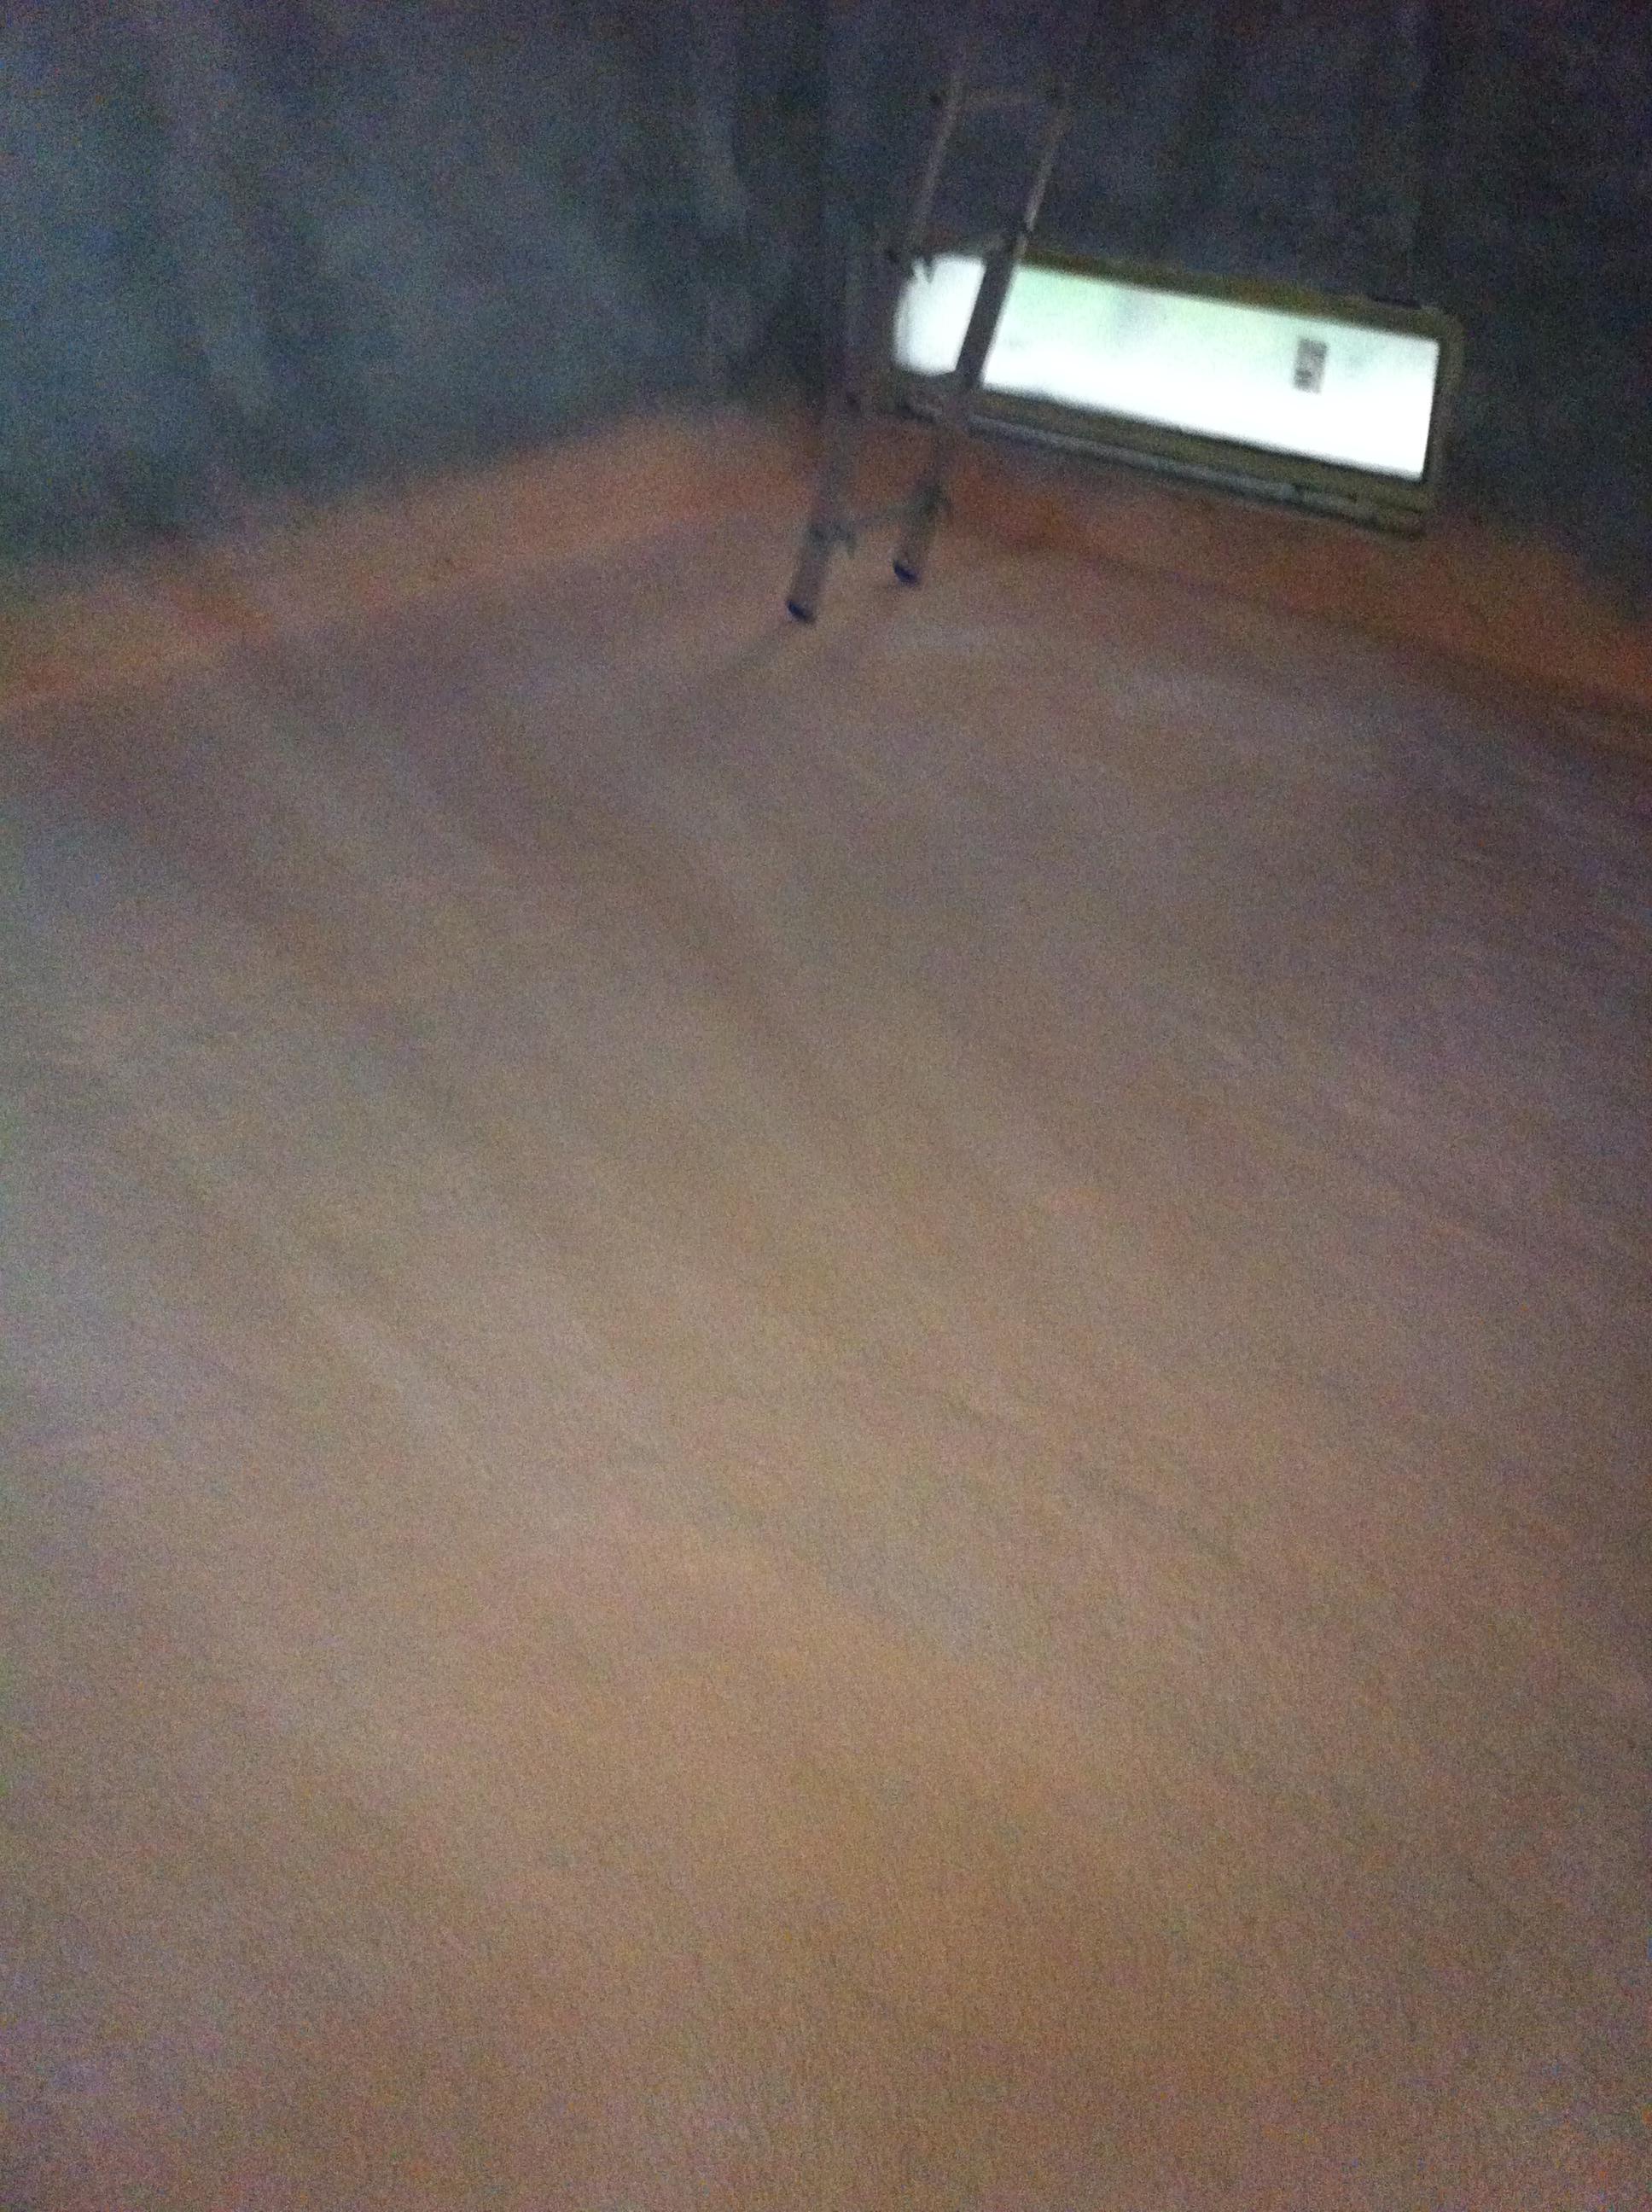 Executie termoizolatii cu spuma poliuretanica MIBAT CONSTRUCT - Poza 6